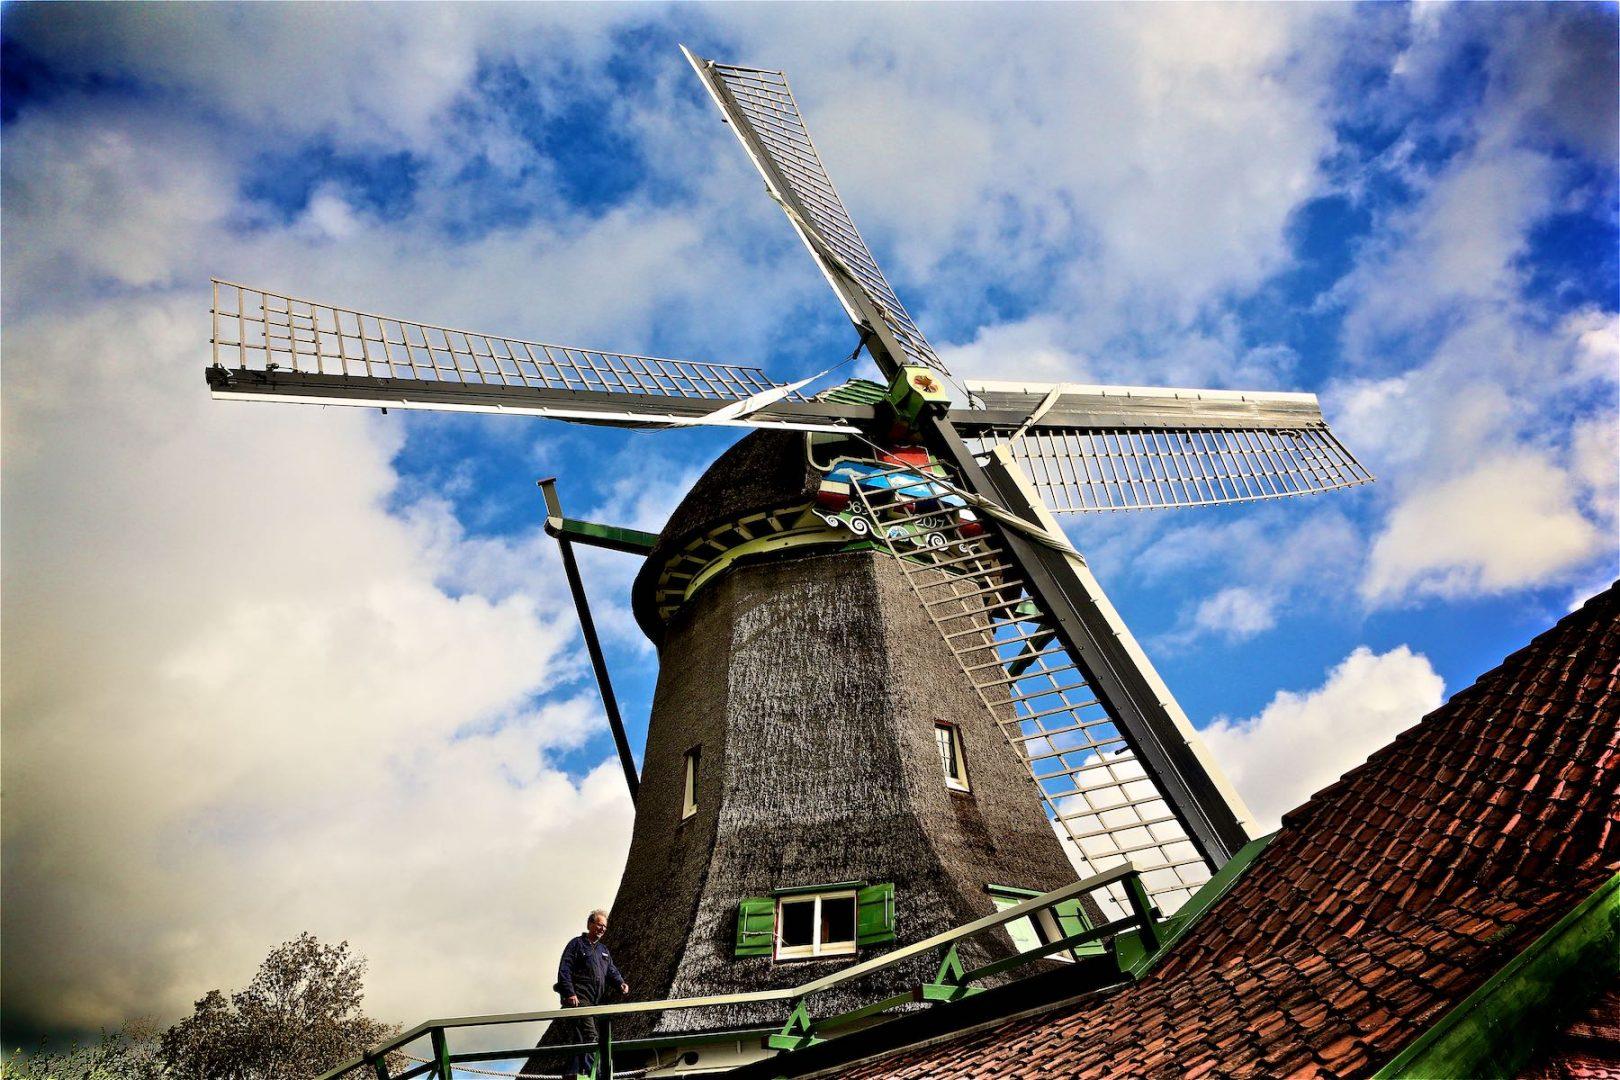 Dutch hempbeater with blue cloudy sky